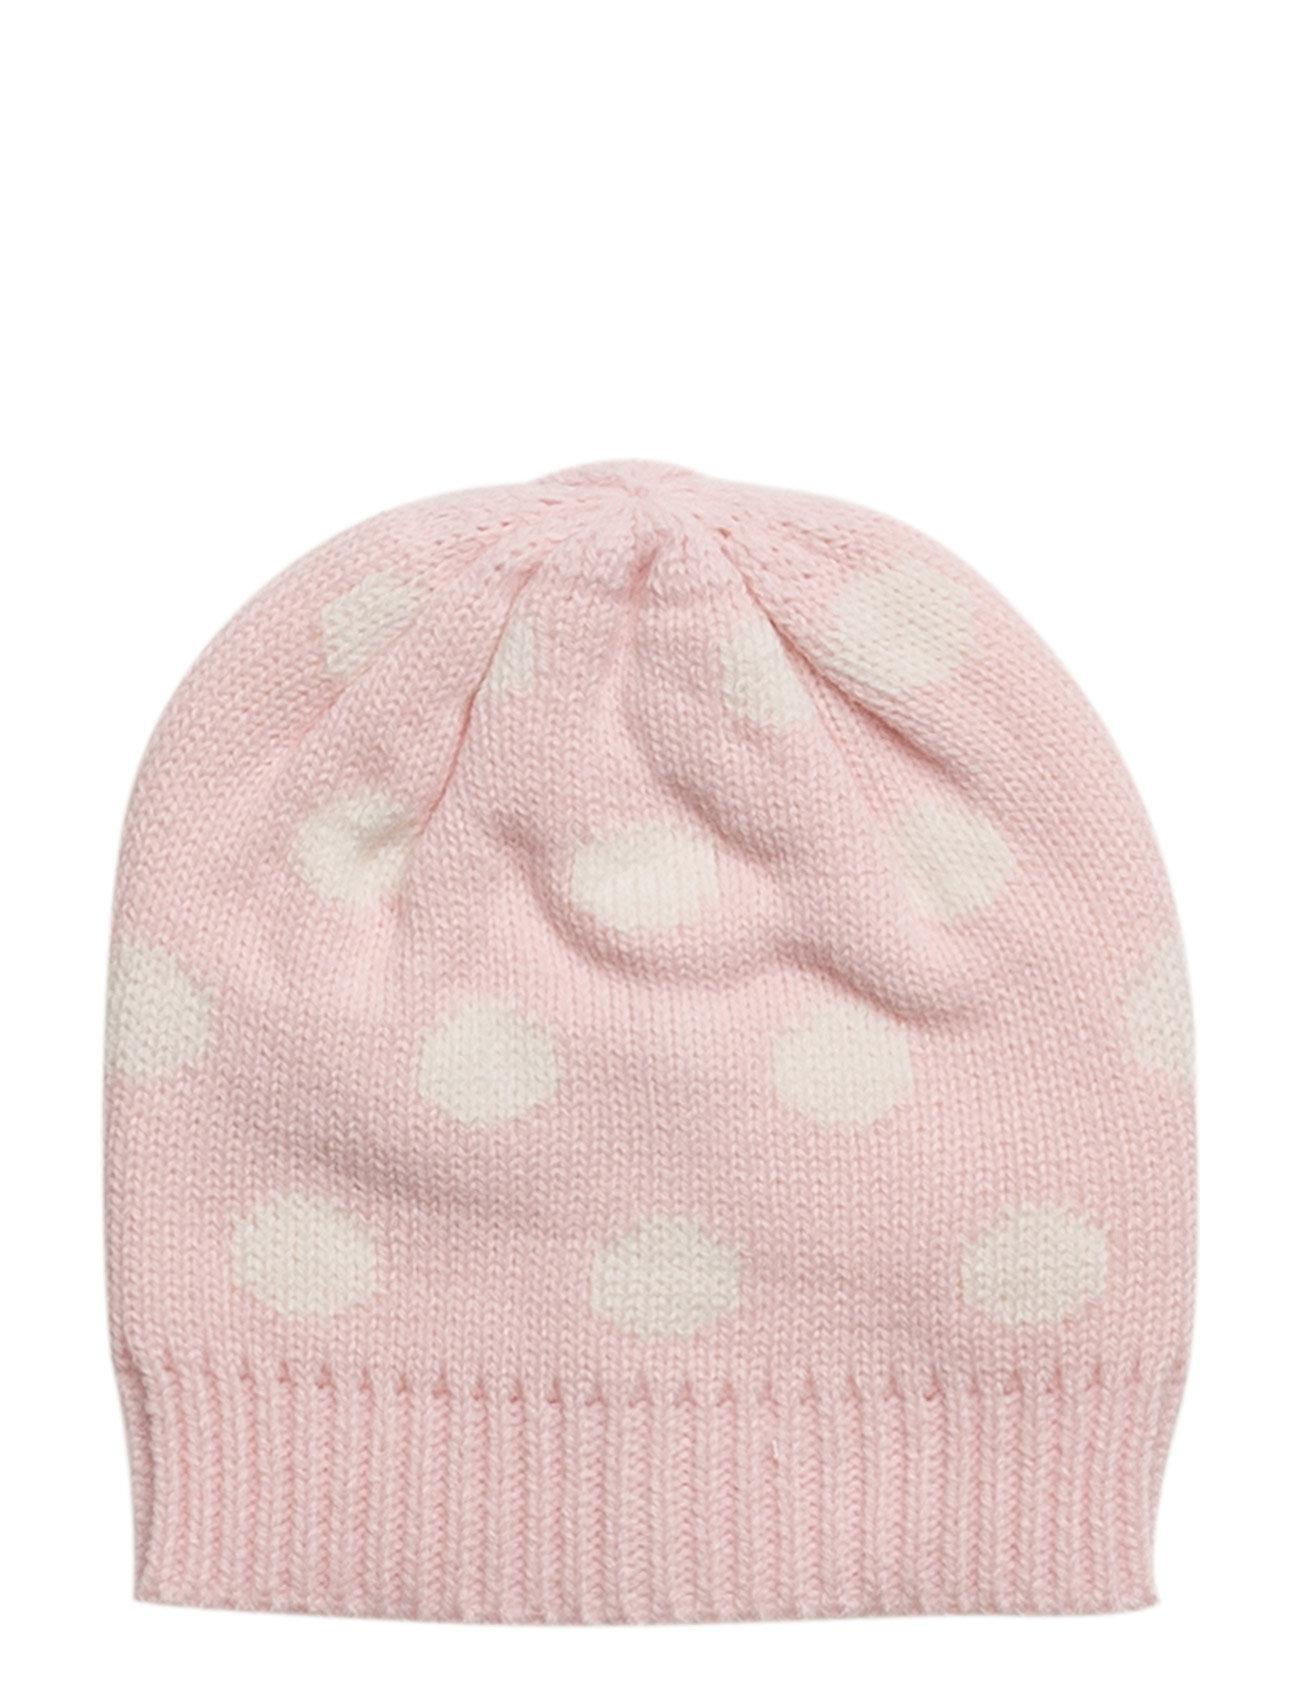 mango kids Knitted dot hat på boozt.com dk